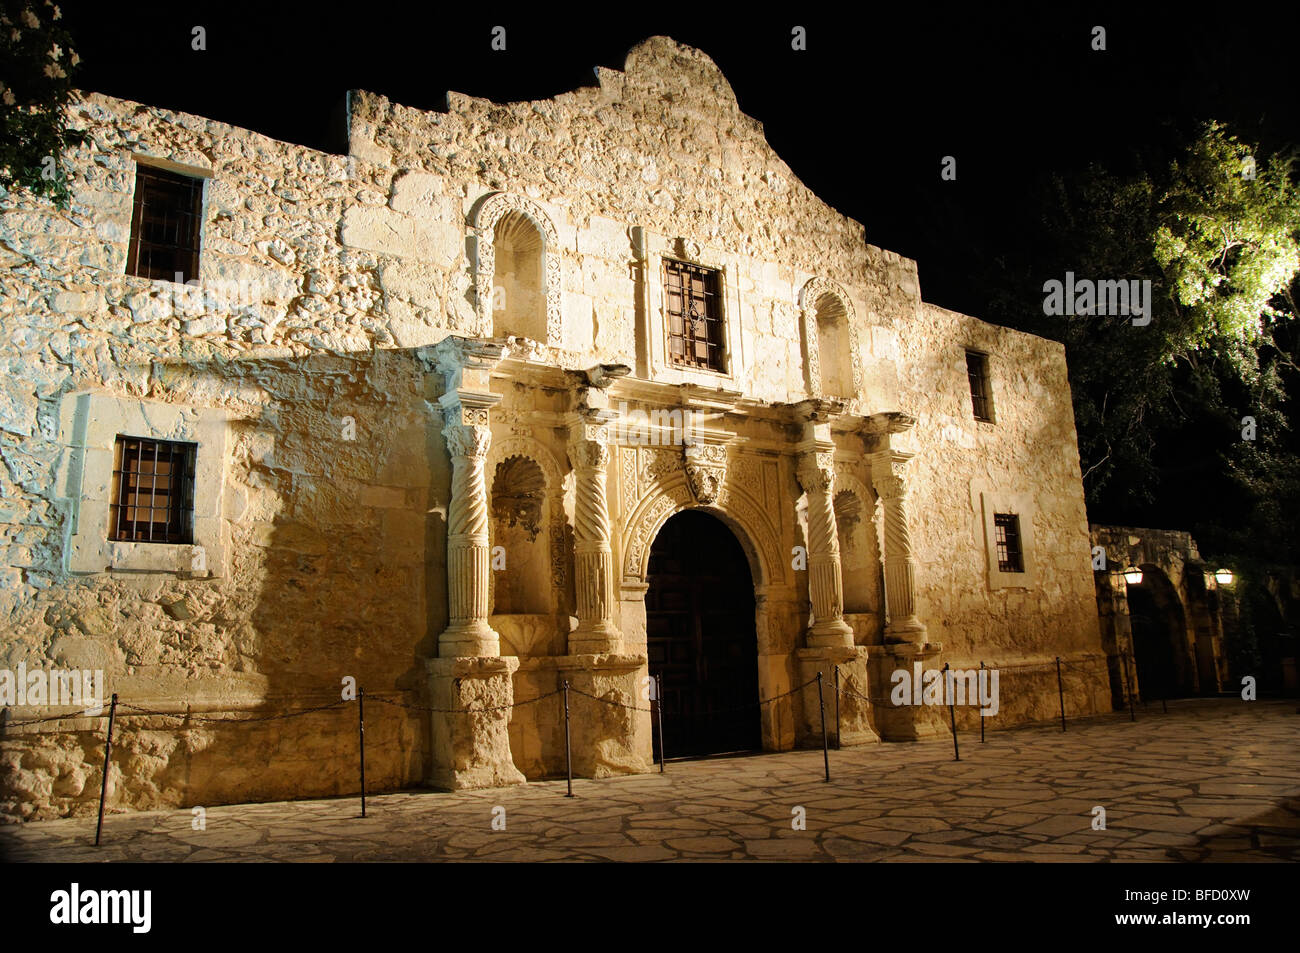 The Alamo, San Antonio, Texas - Stock Image